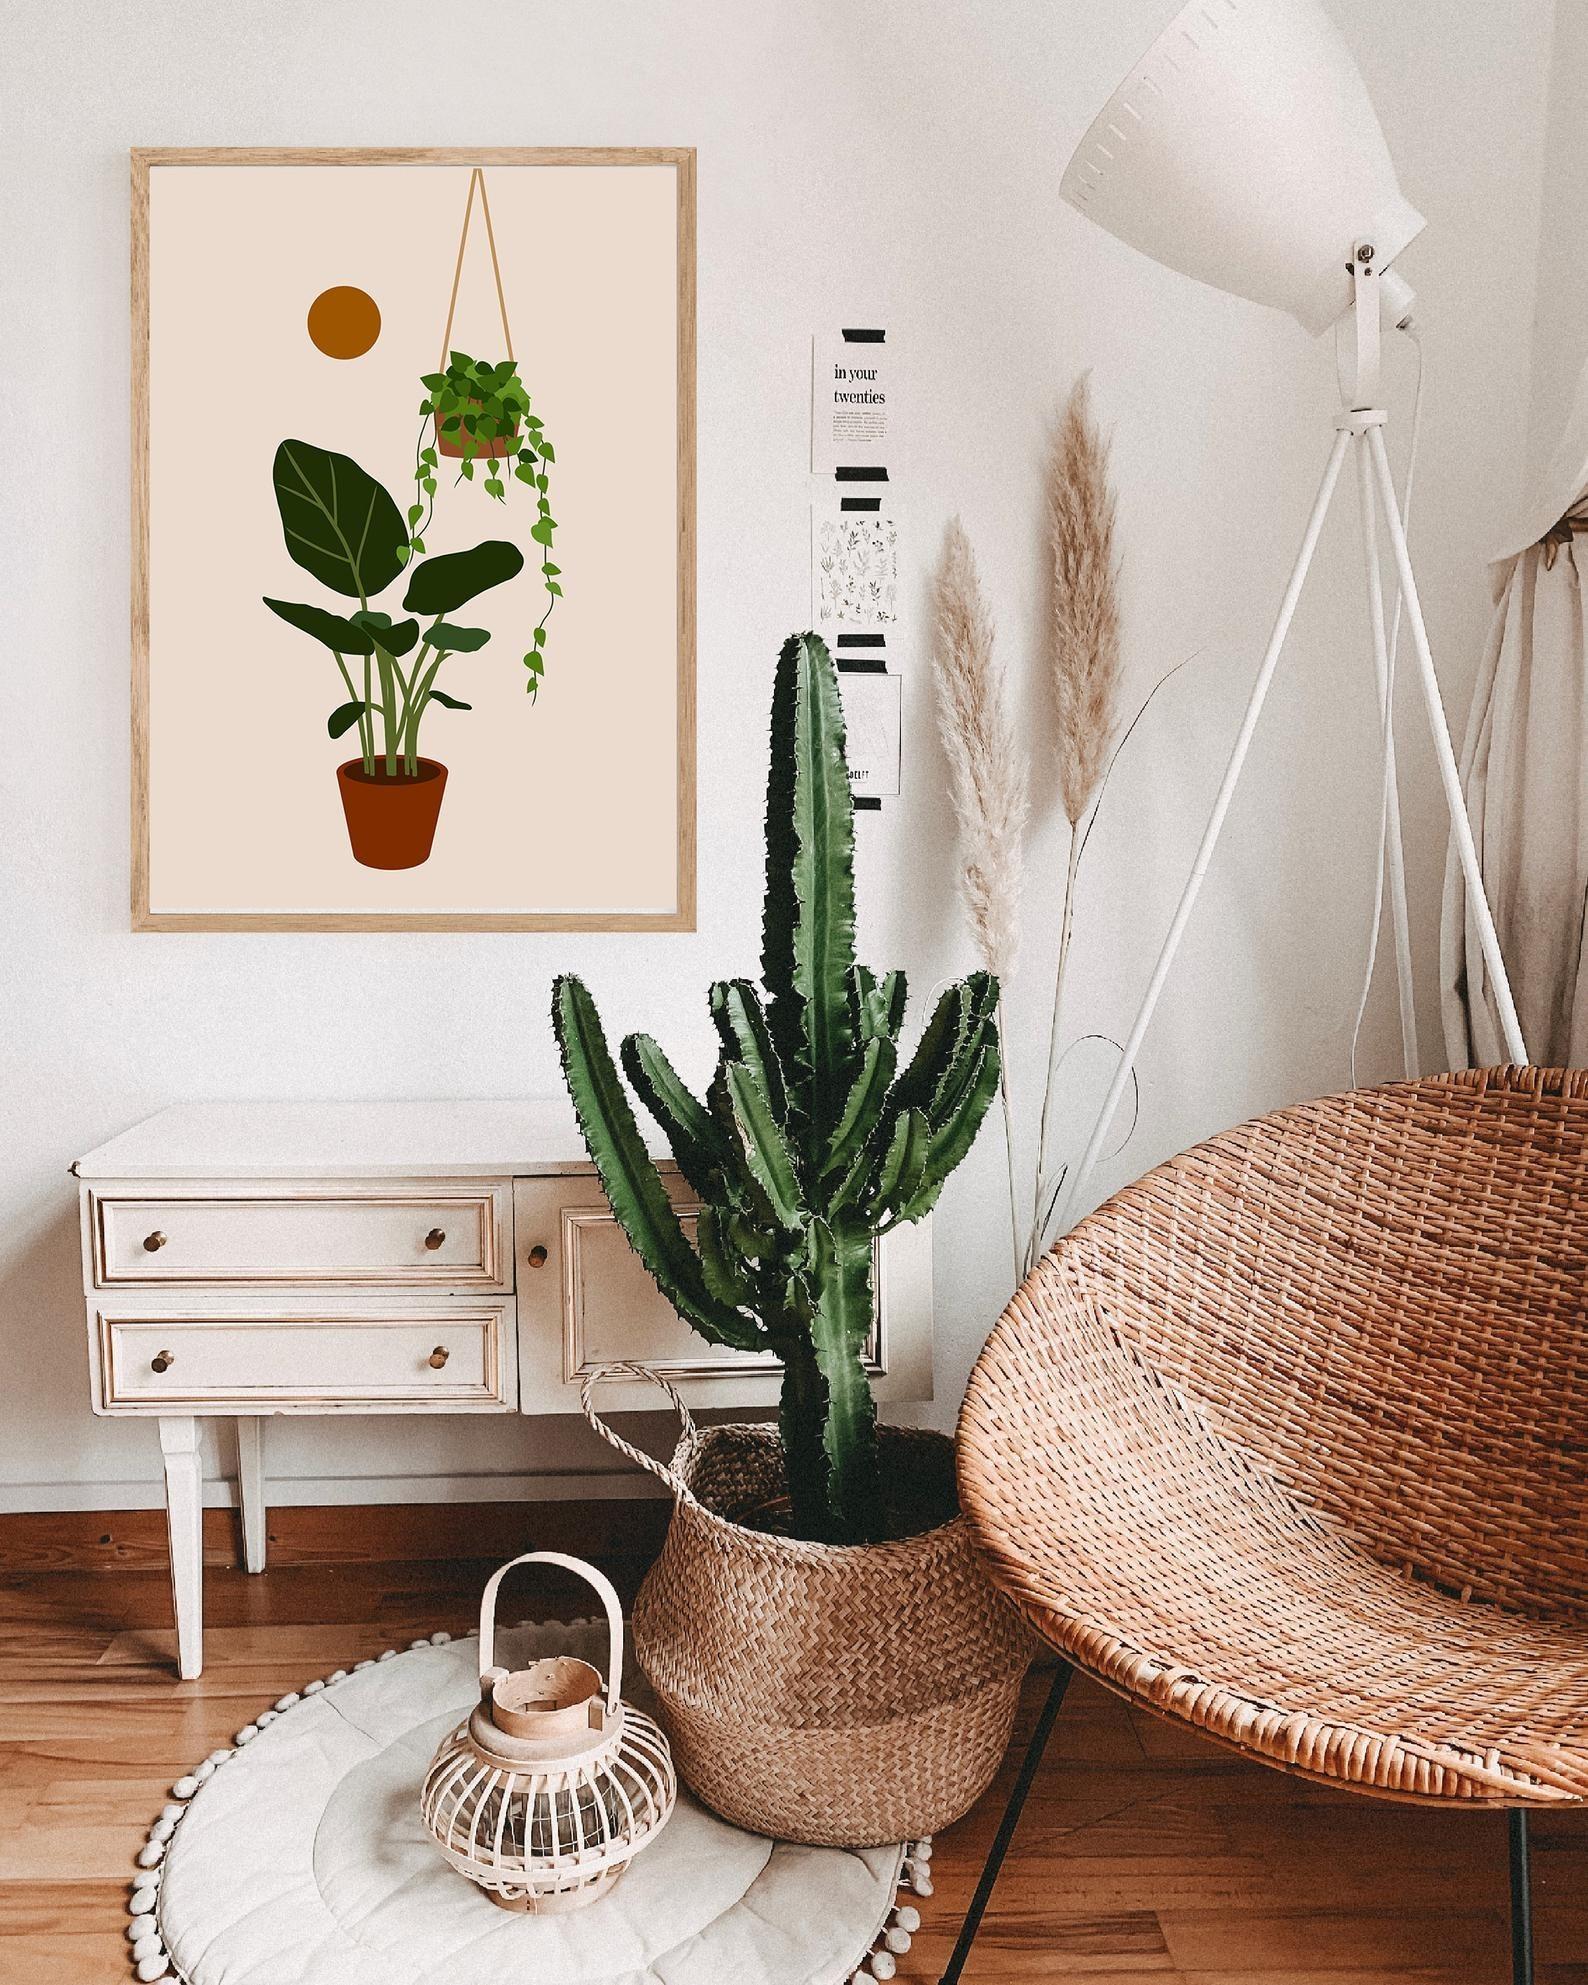 A plant art print framed on a wall